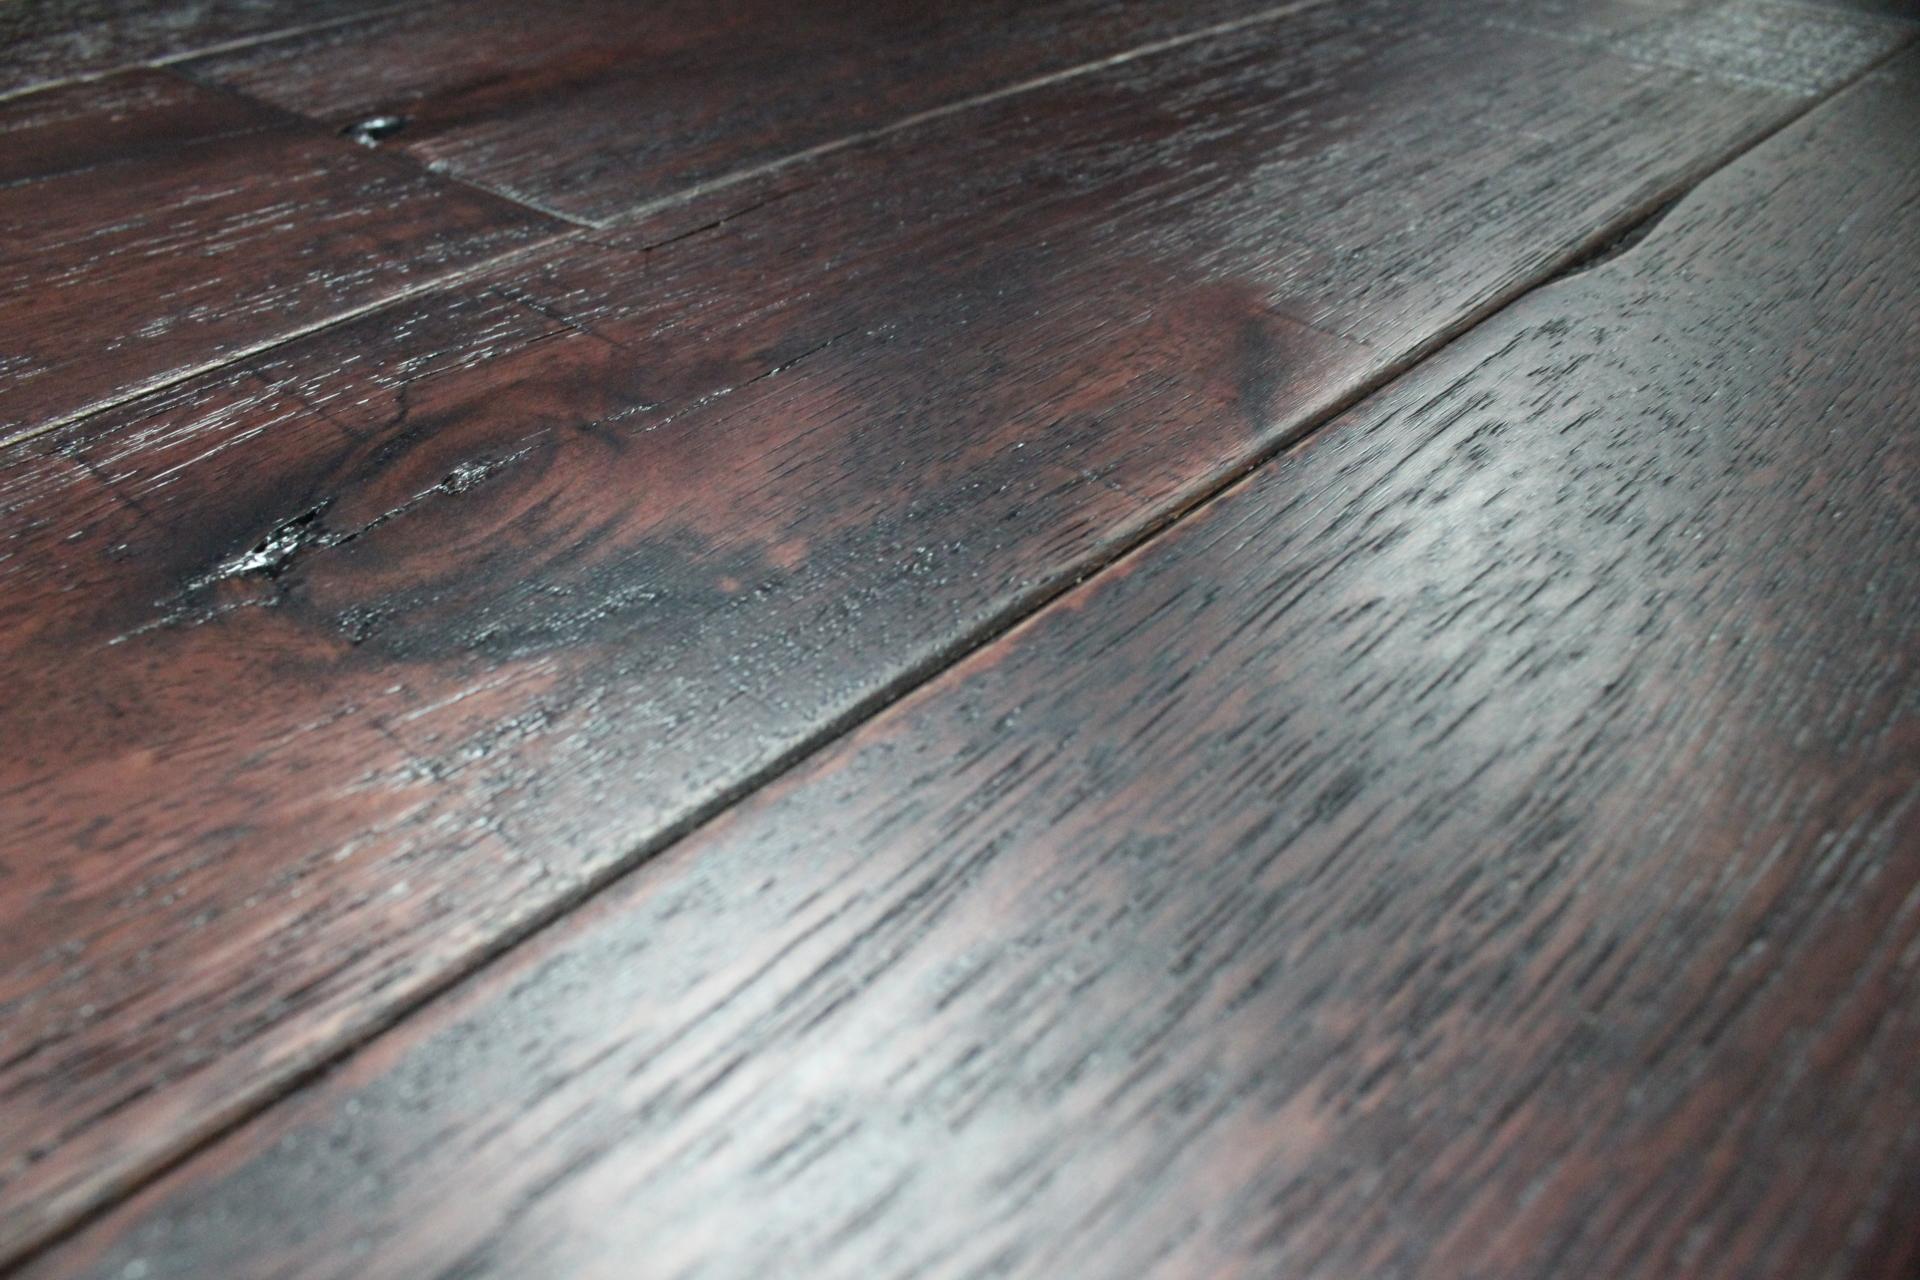 Hardwood, prefinished floor, engineered wood, solid wood, lifestyle, hard surface, prefinished hardwood, prefinished wood, home, design, interior design, wood floor design, provenza